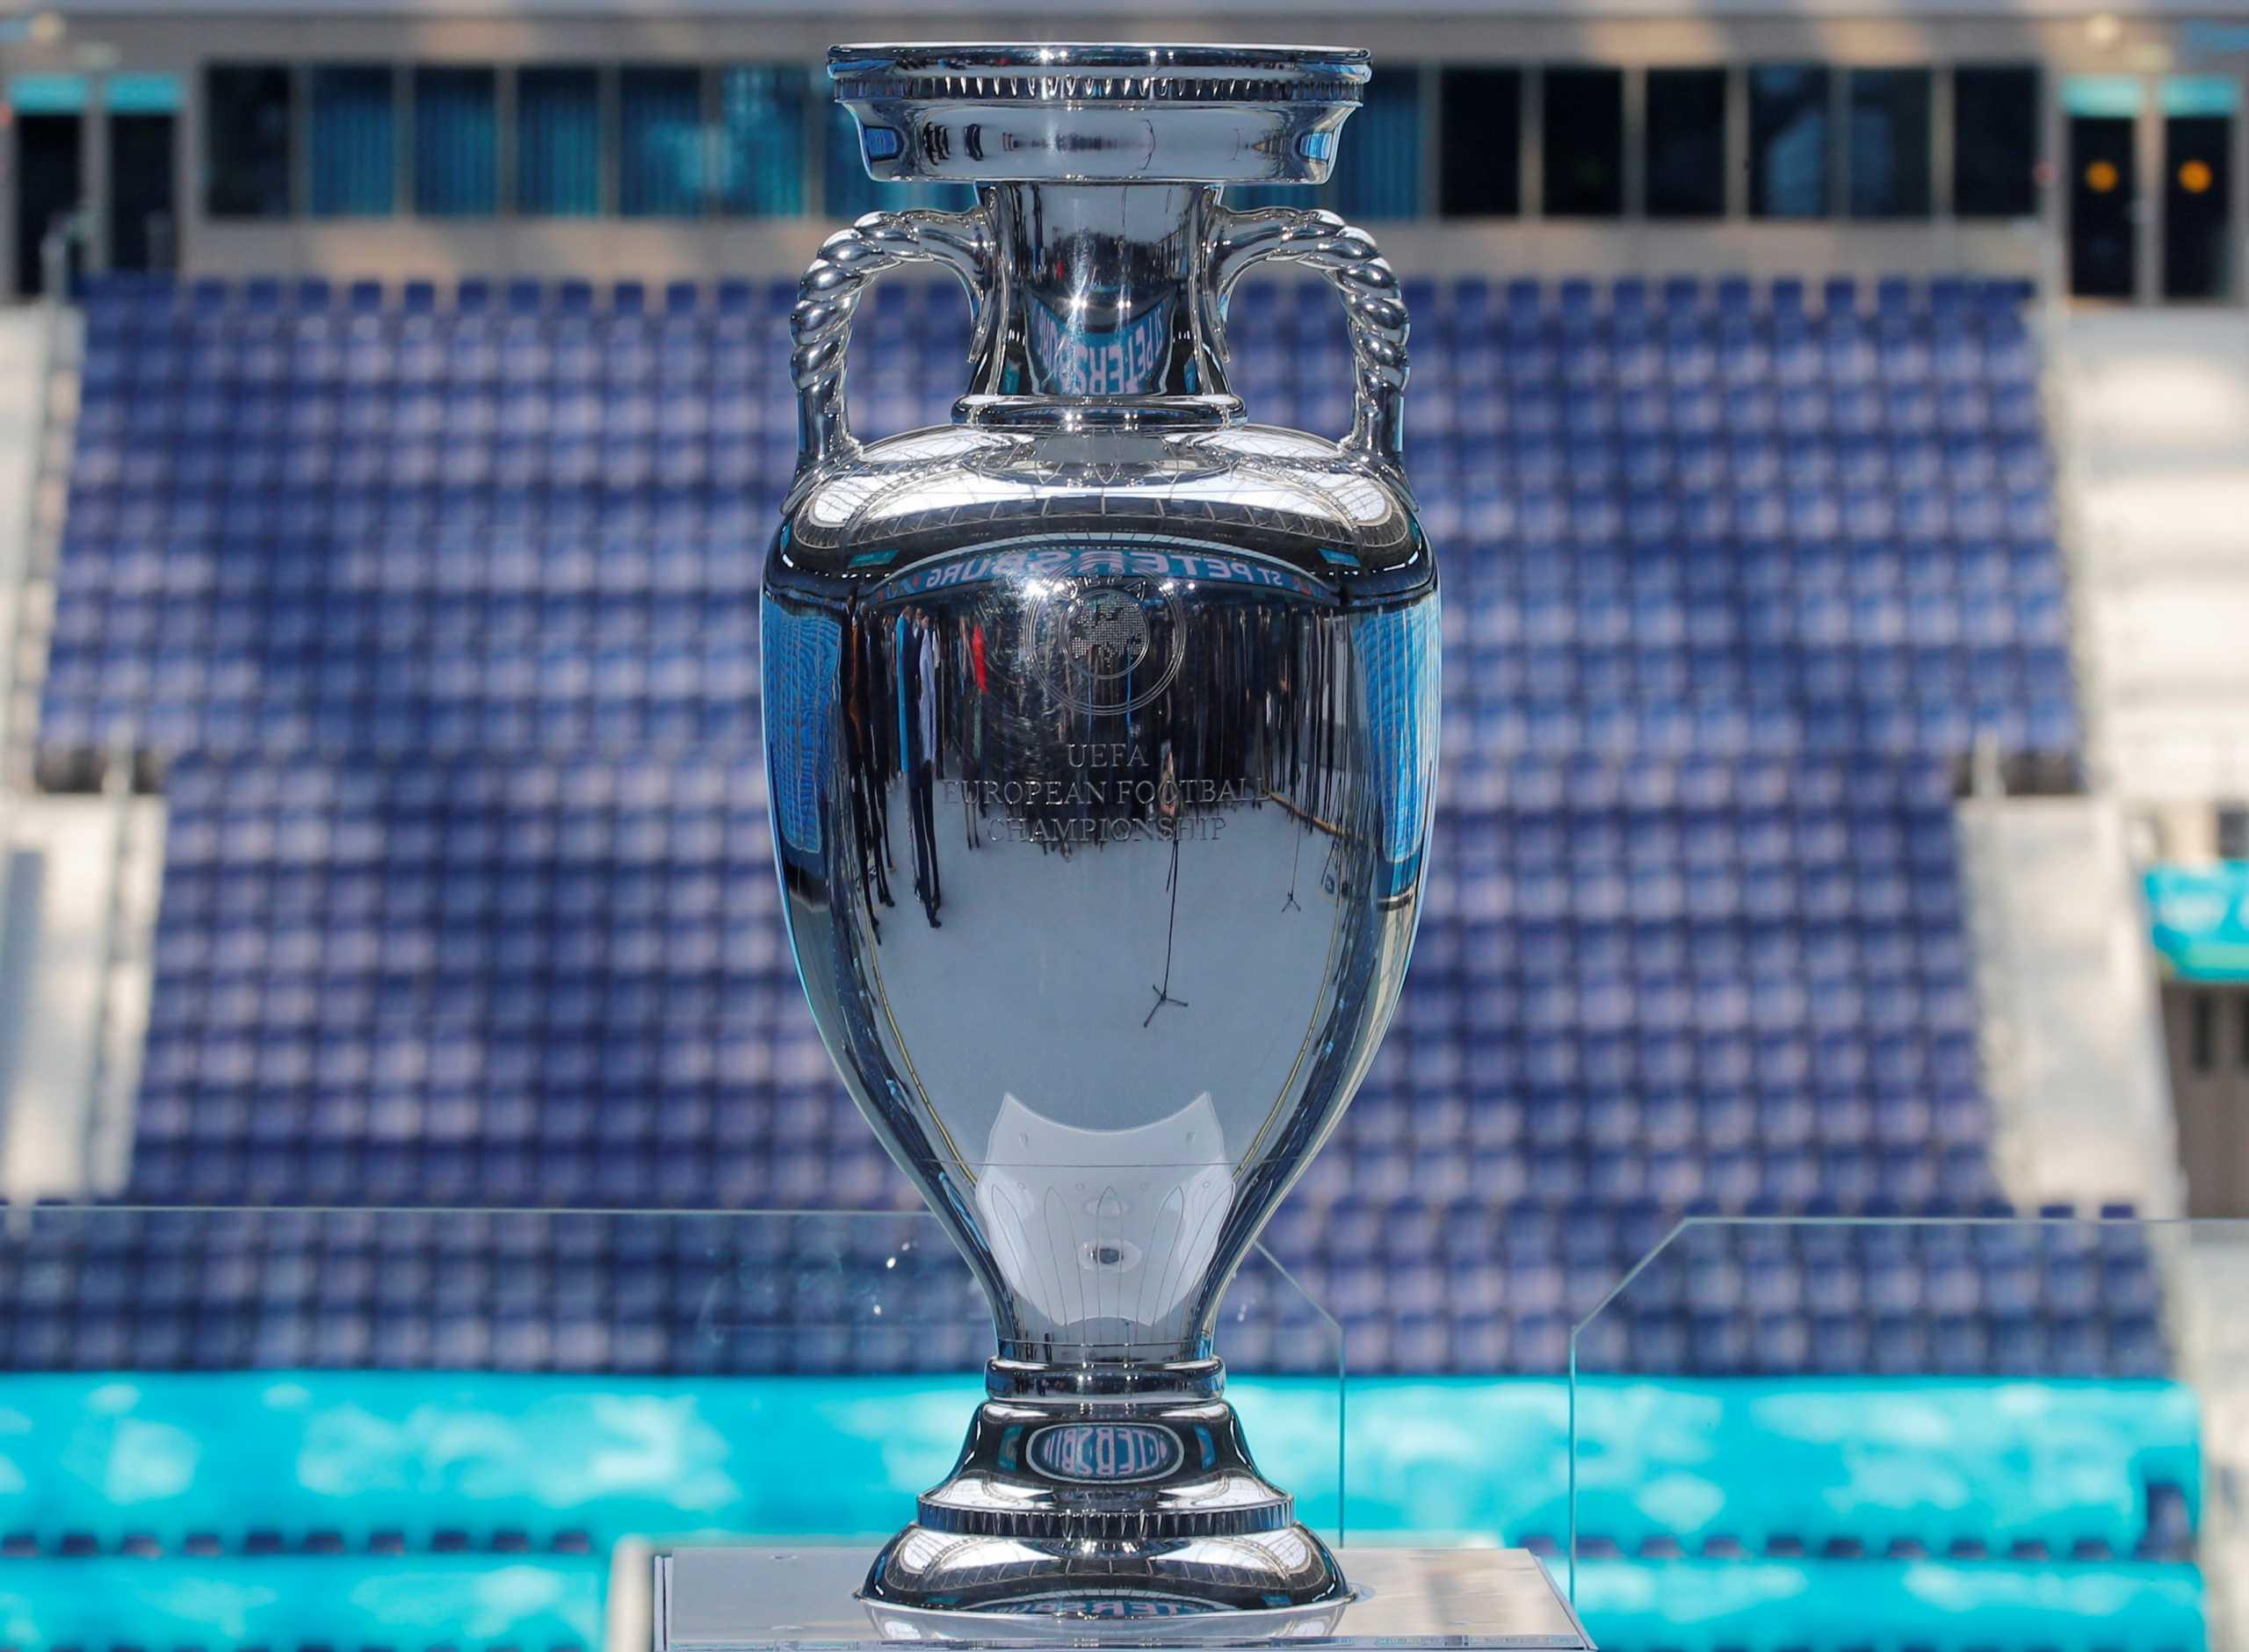 Euro 2020: Το πρόγραμμα των αγώνων της διοργάνωσης